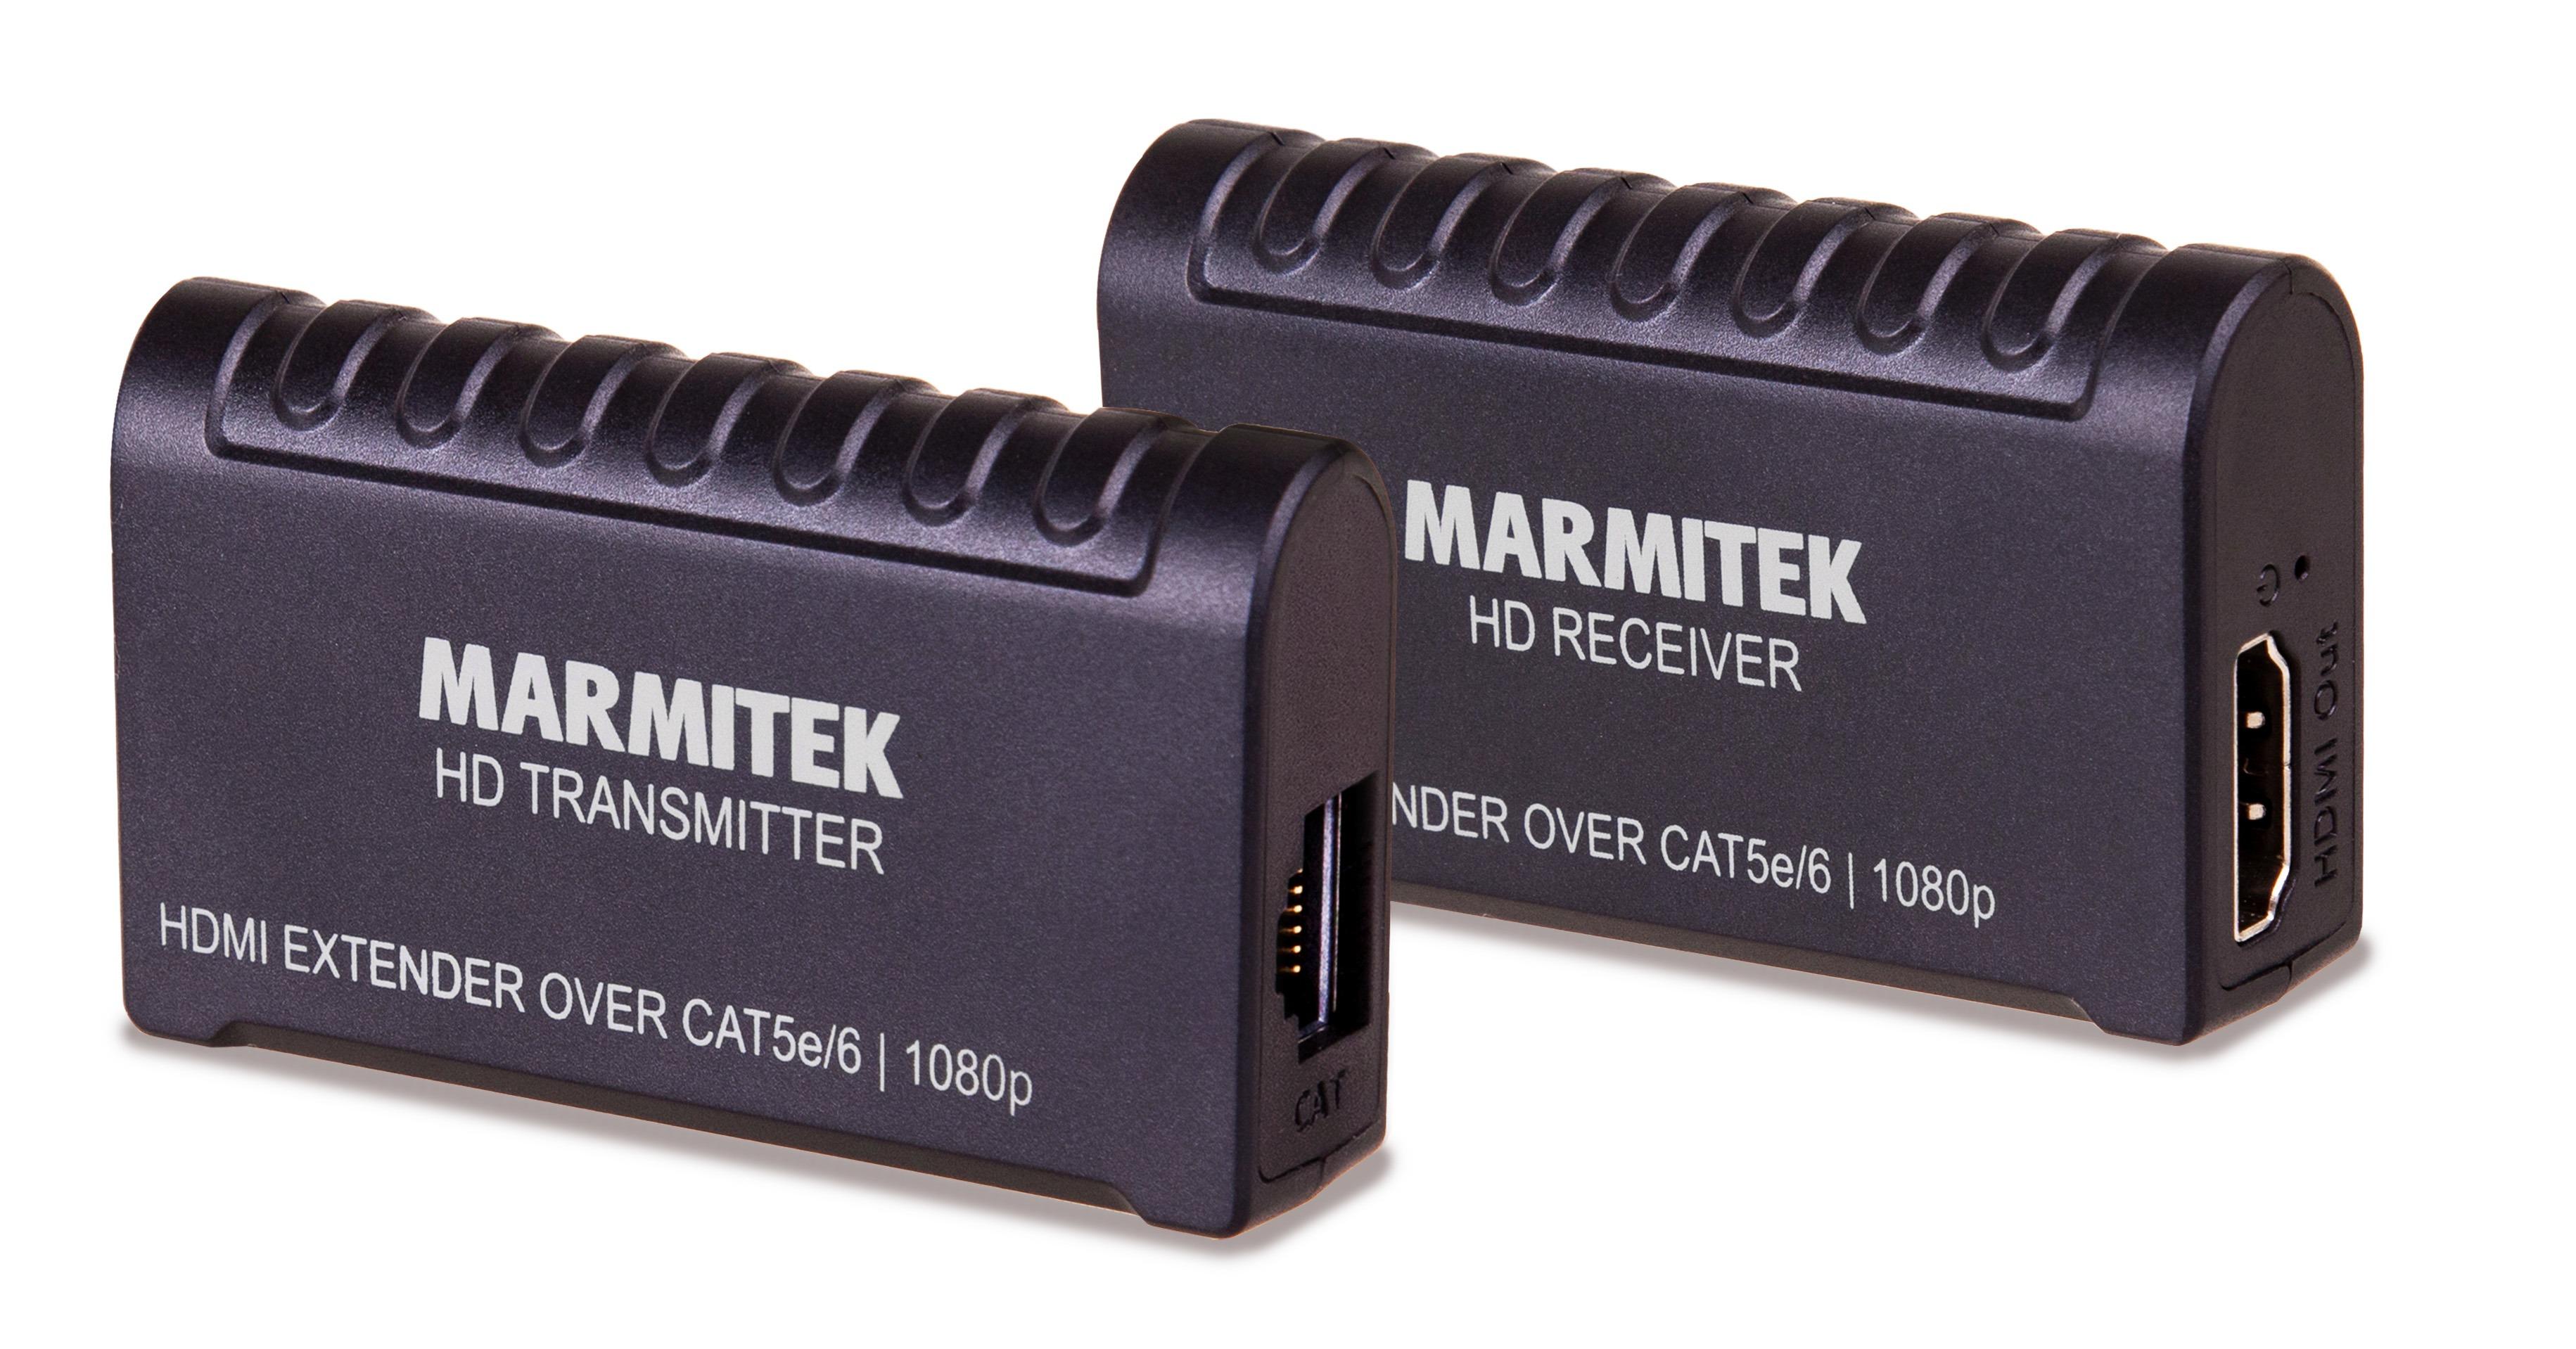 Marmitek extender MegaView 63